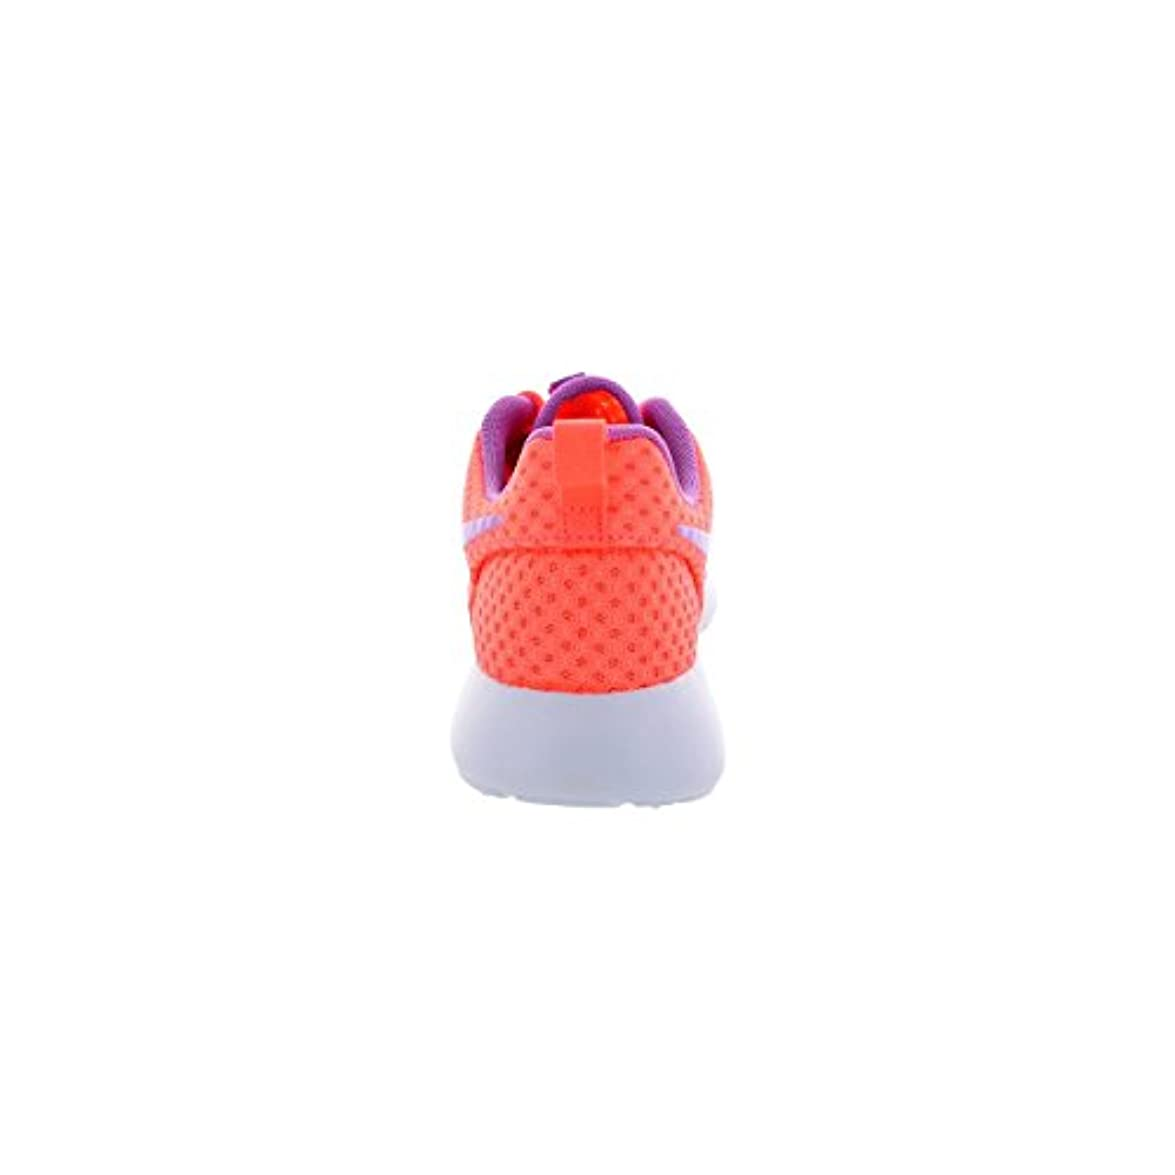 Nike Scarpe Da Ginnastica One Roshe Ref 724850-661